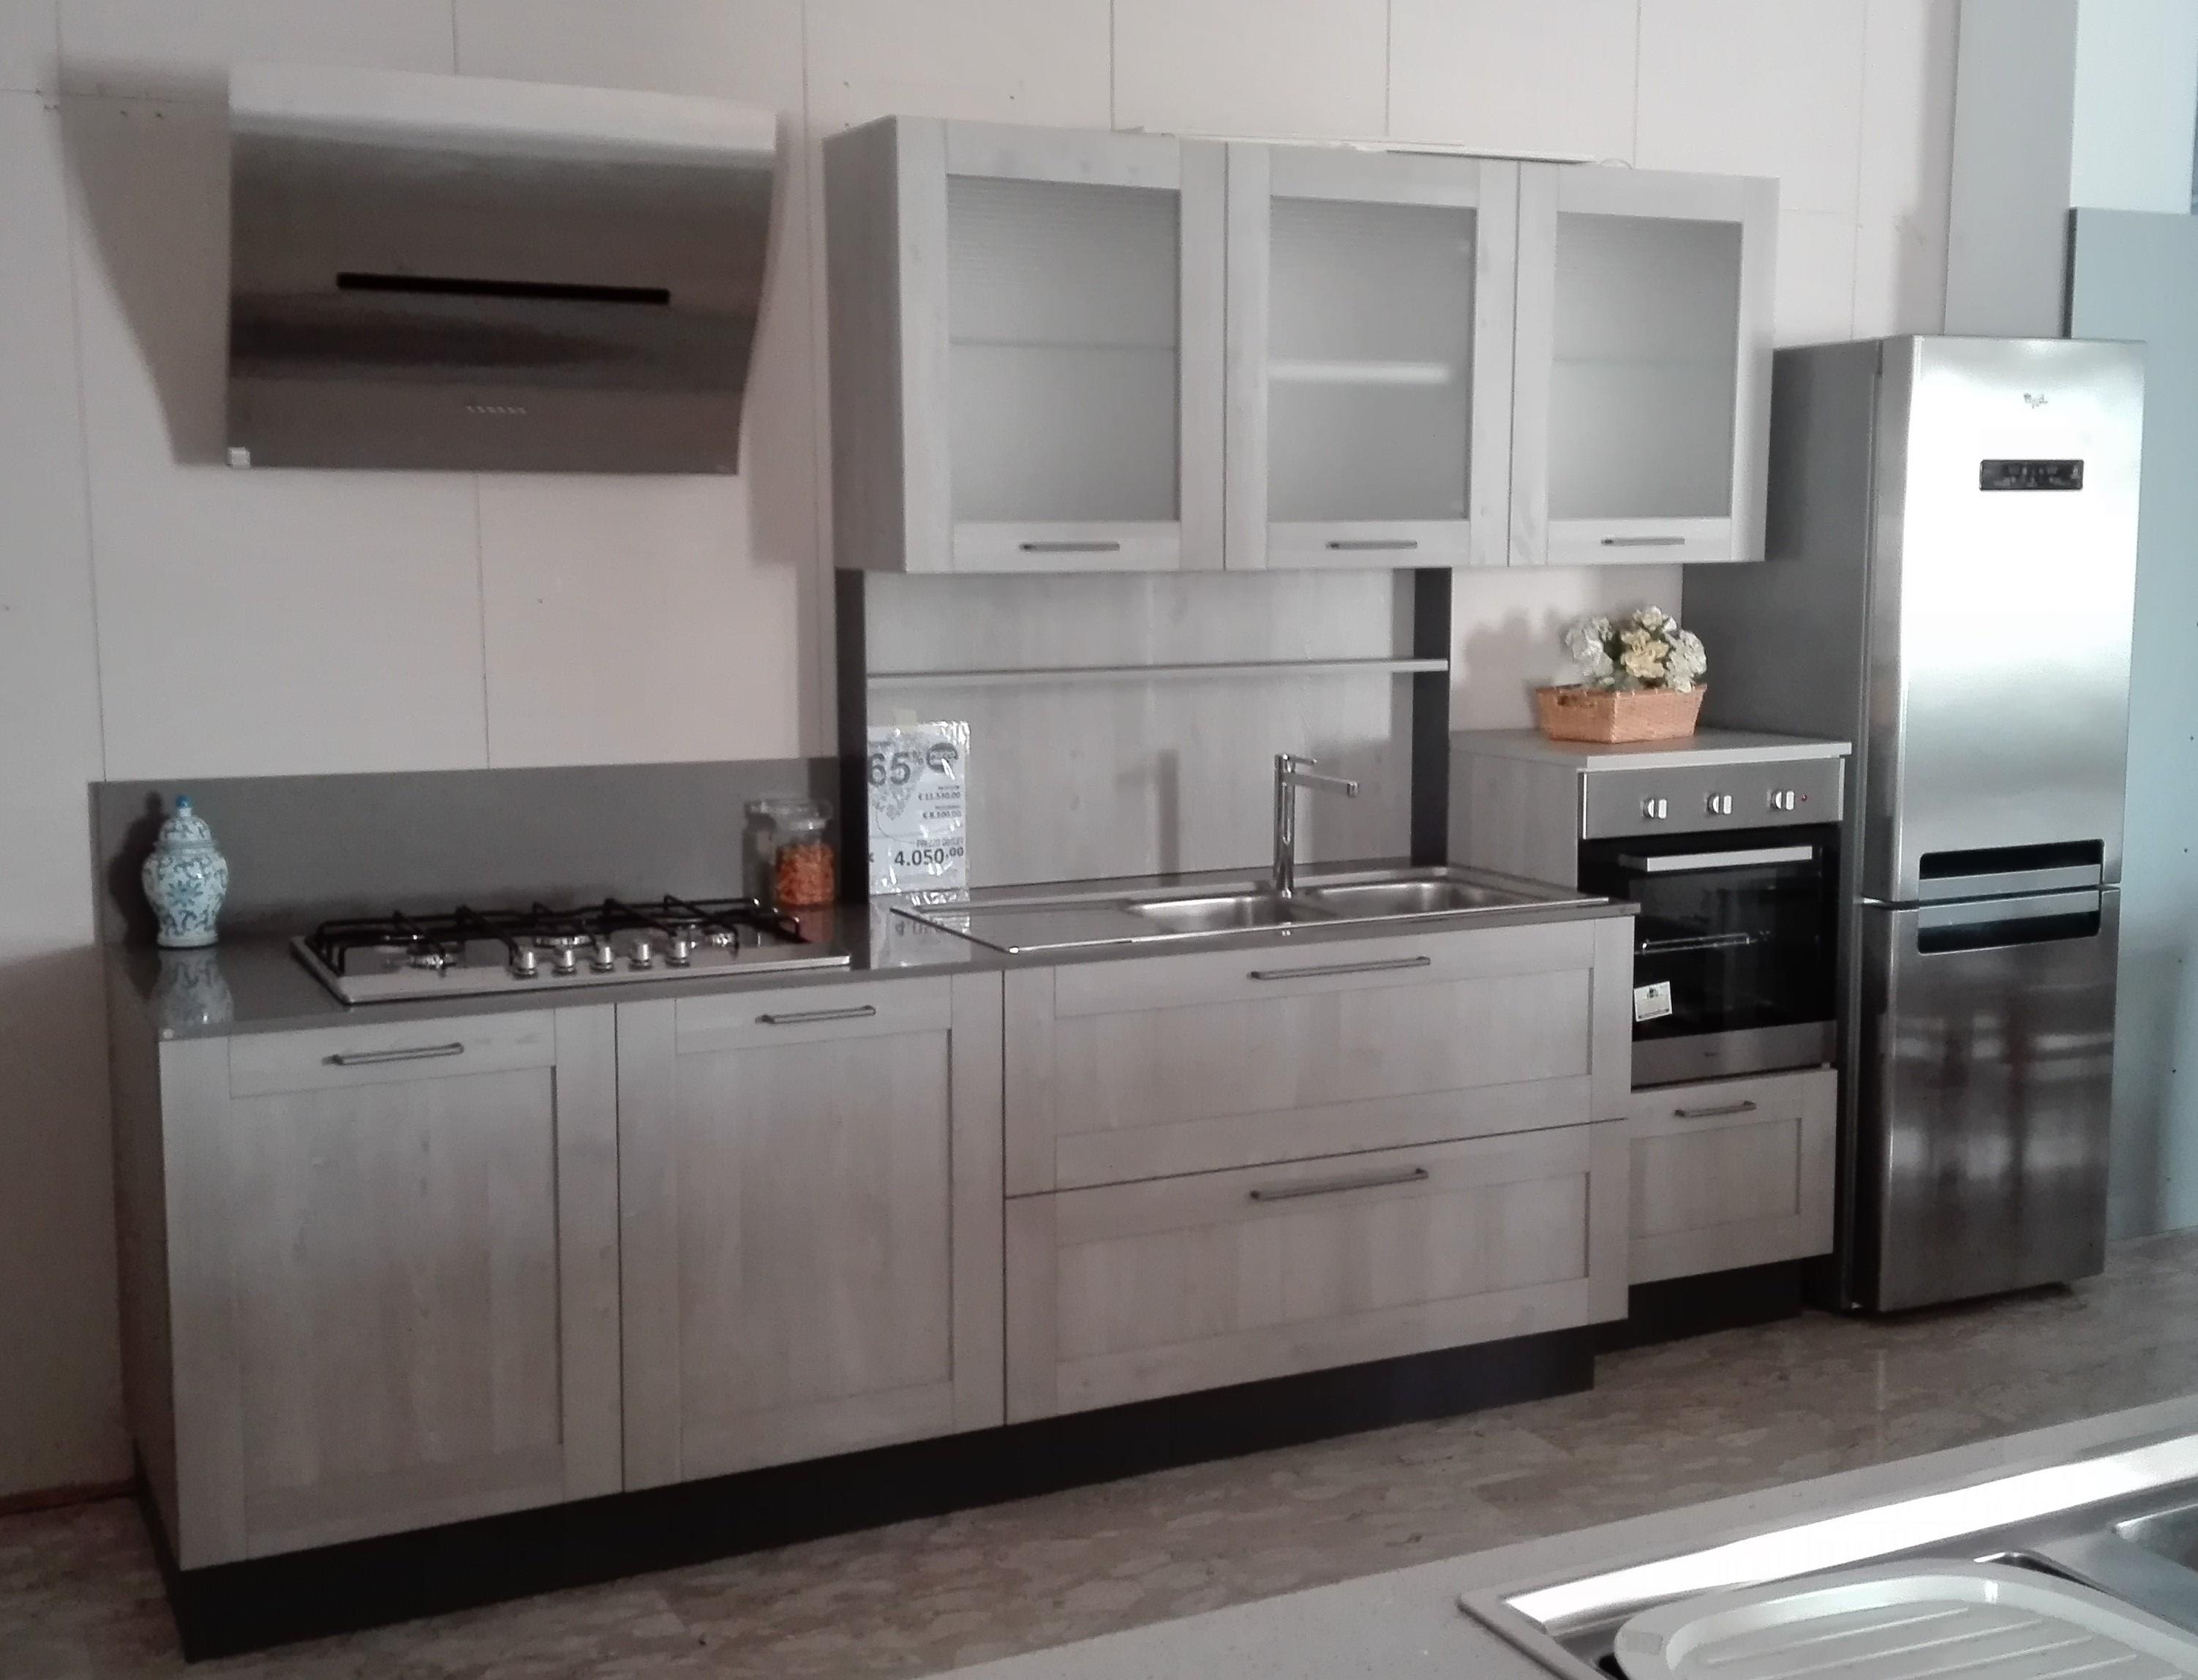 Stosa Cucine Cucina Maya scontato del -65 % - Cucine a prezzi scontati